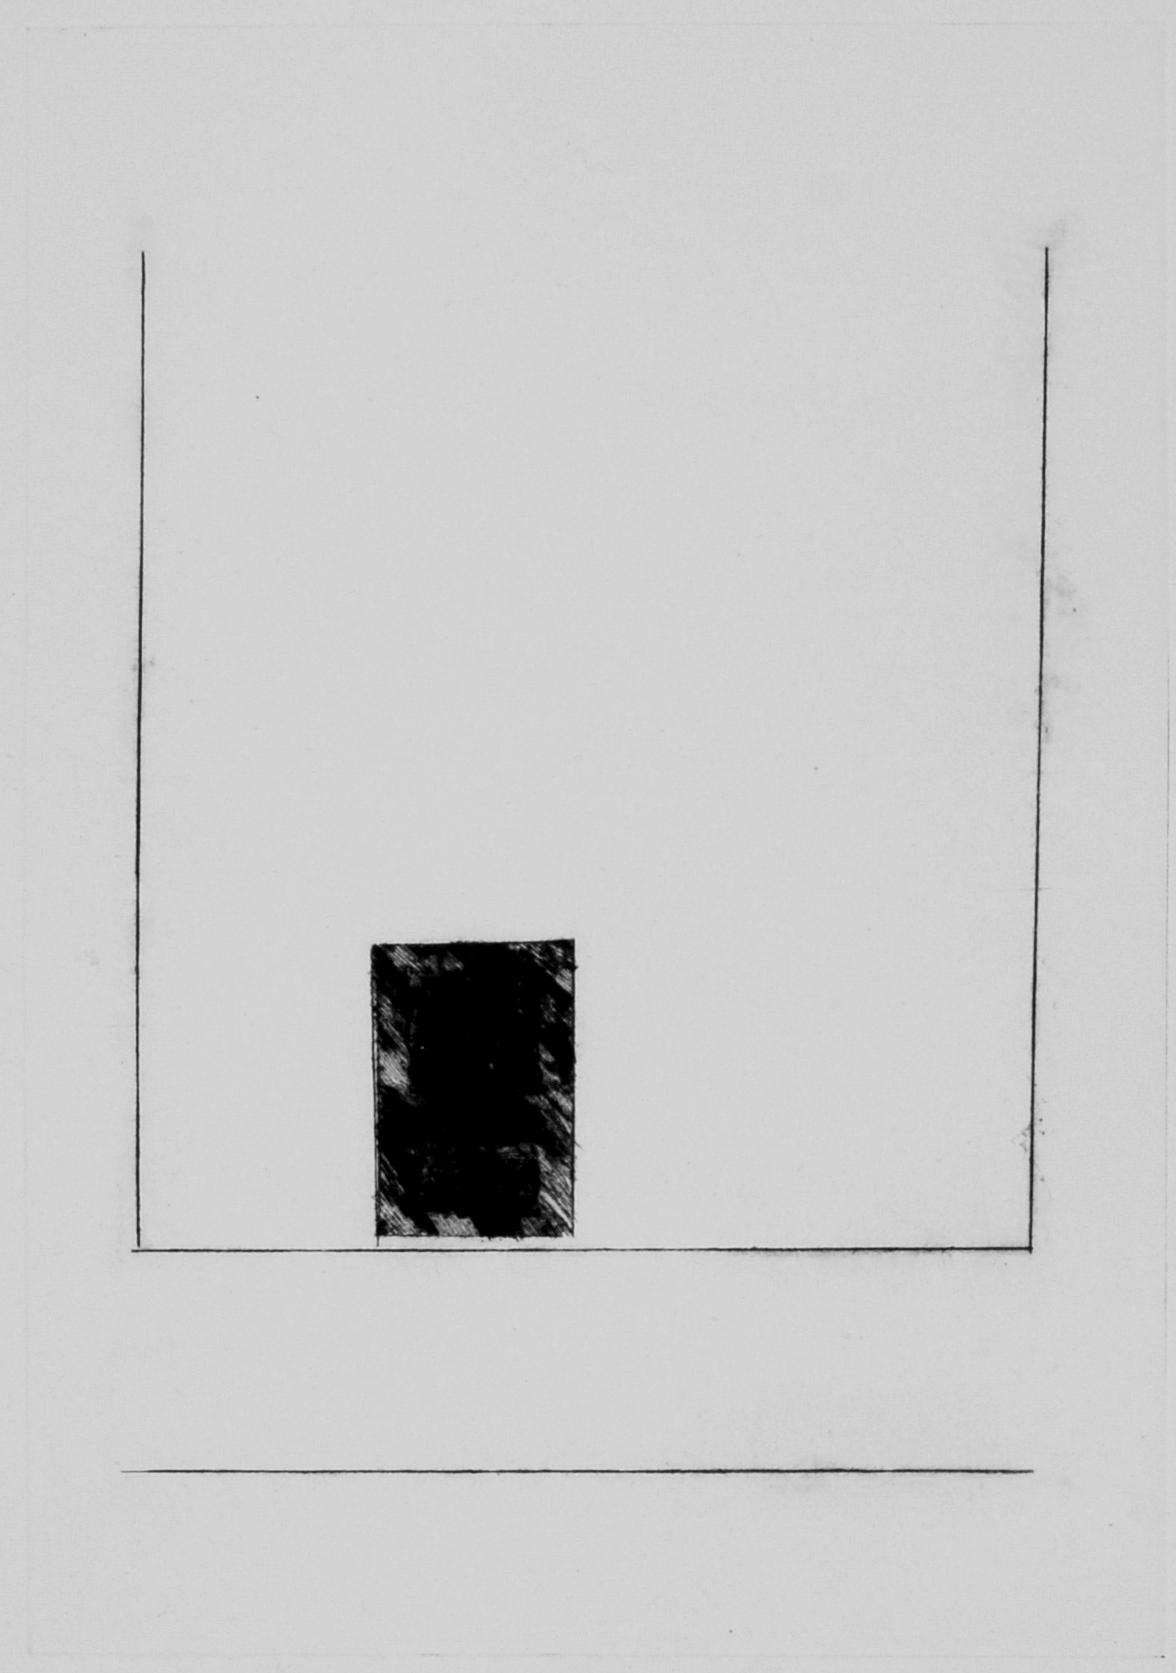 12.04_PORTES_EXPOSITION_IMAGES_GRAVURES_07